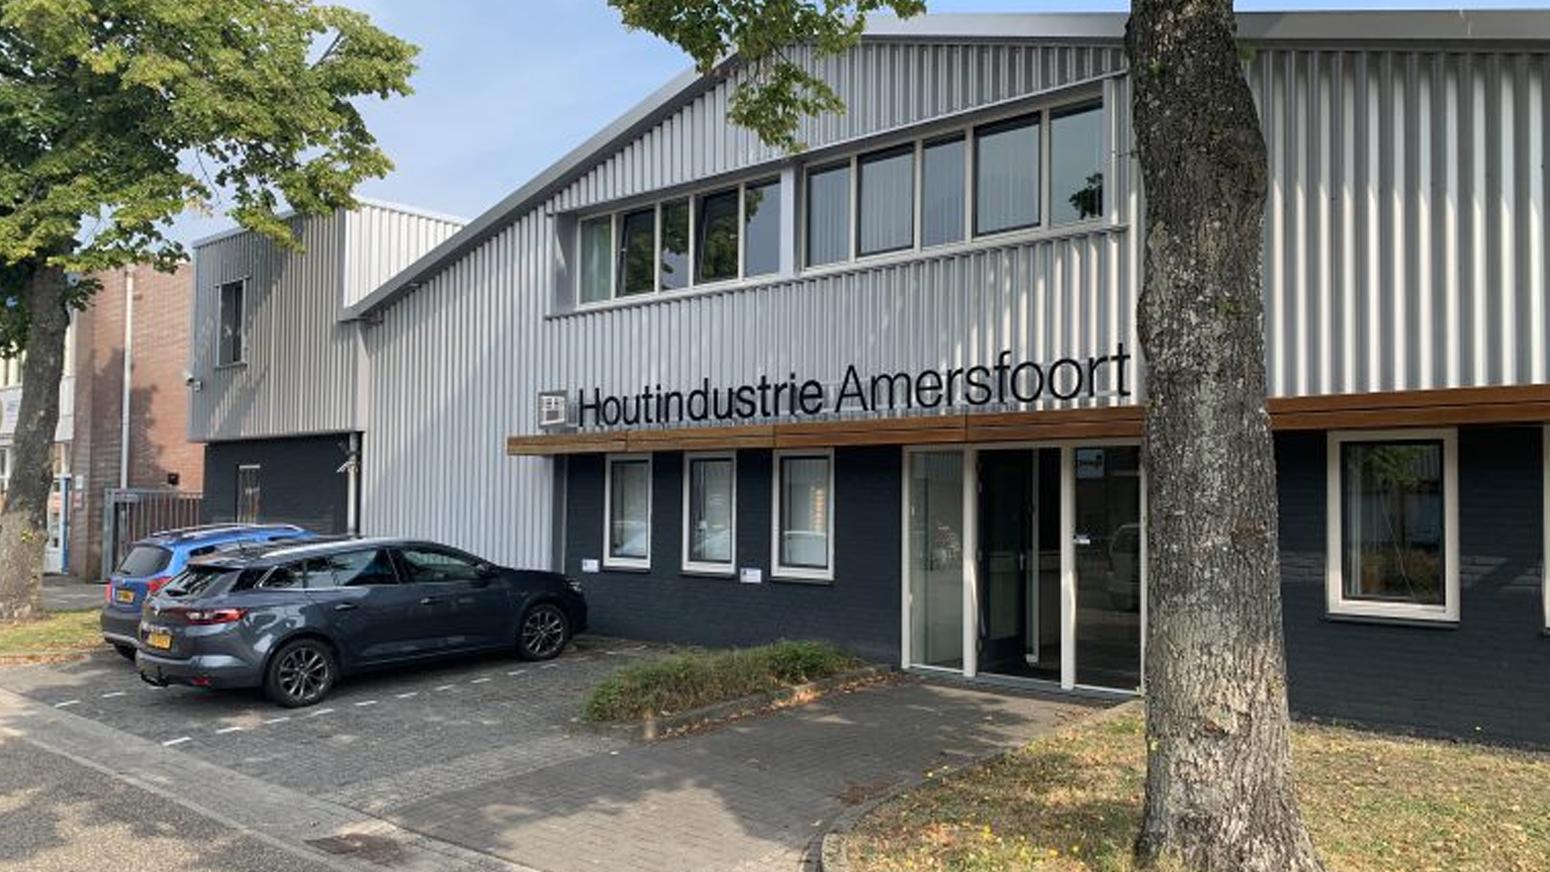 Gebouw Van Houtindustrie Amersfoort